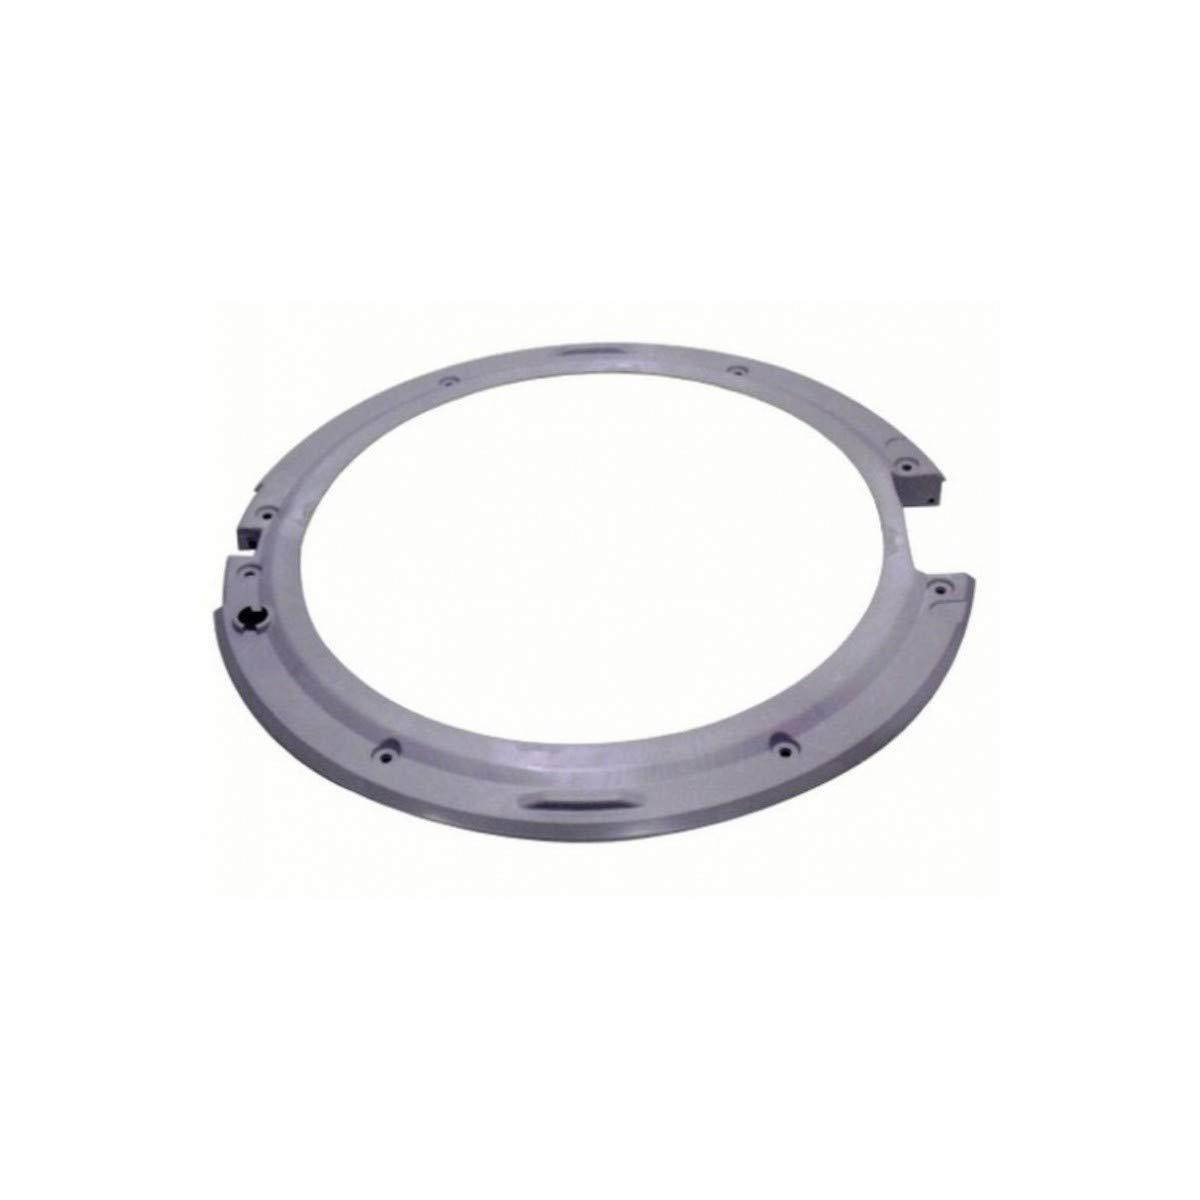 Recamania Puerta escotilla Lavadora Electrolux EWF1080 1108253004 ...